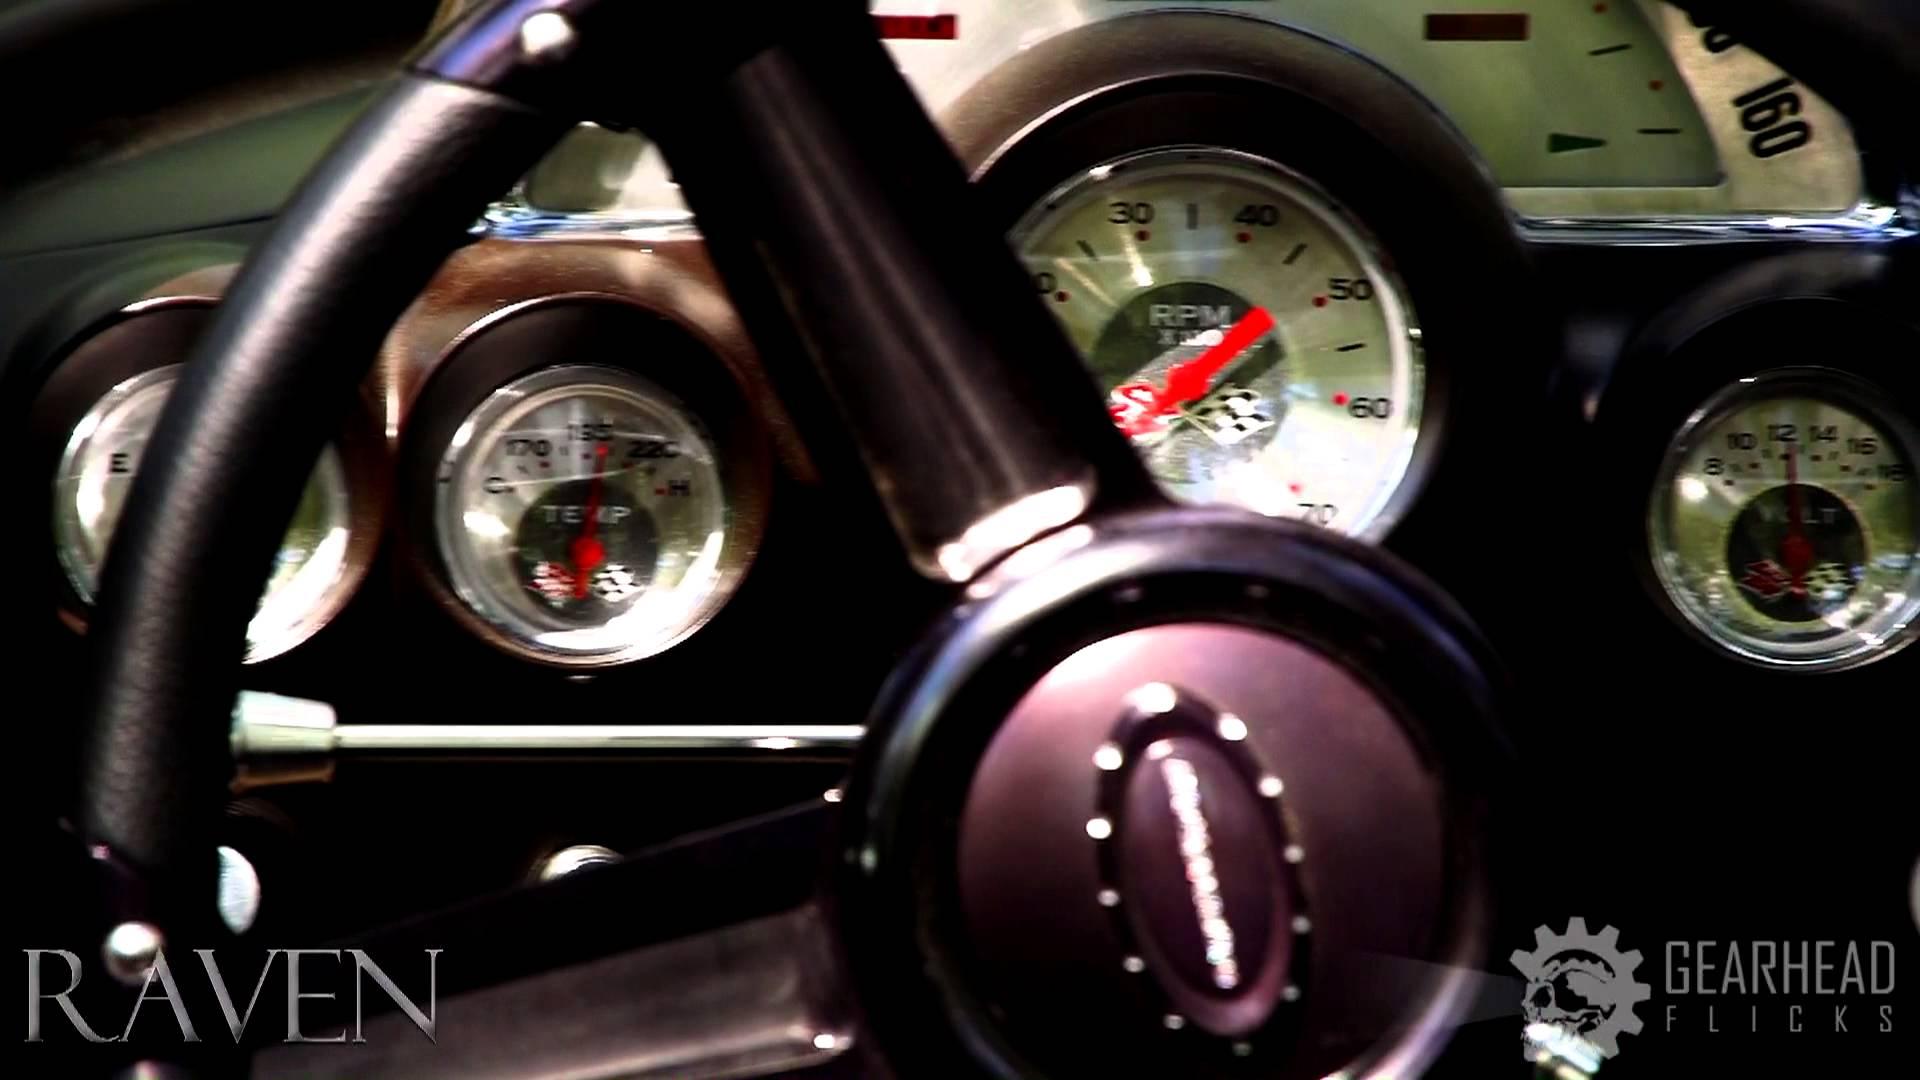 Deral Knight's 1959 Corvette  'Raven' Flies!